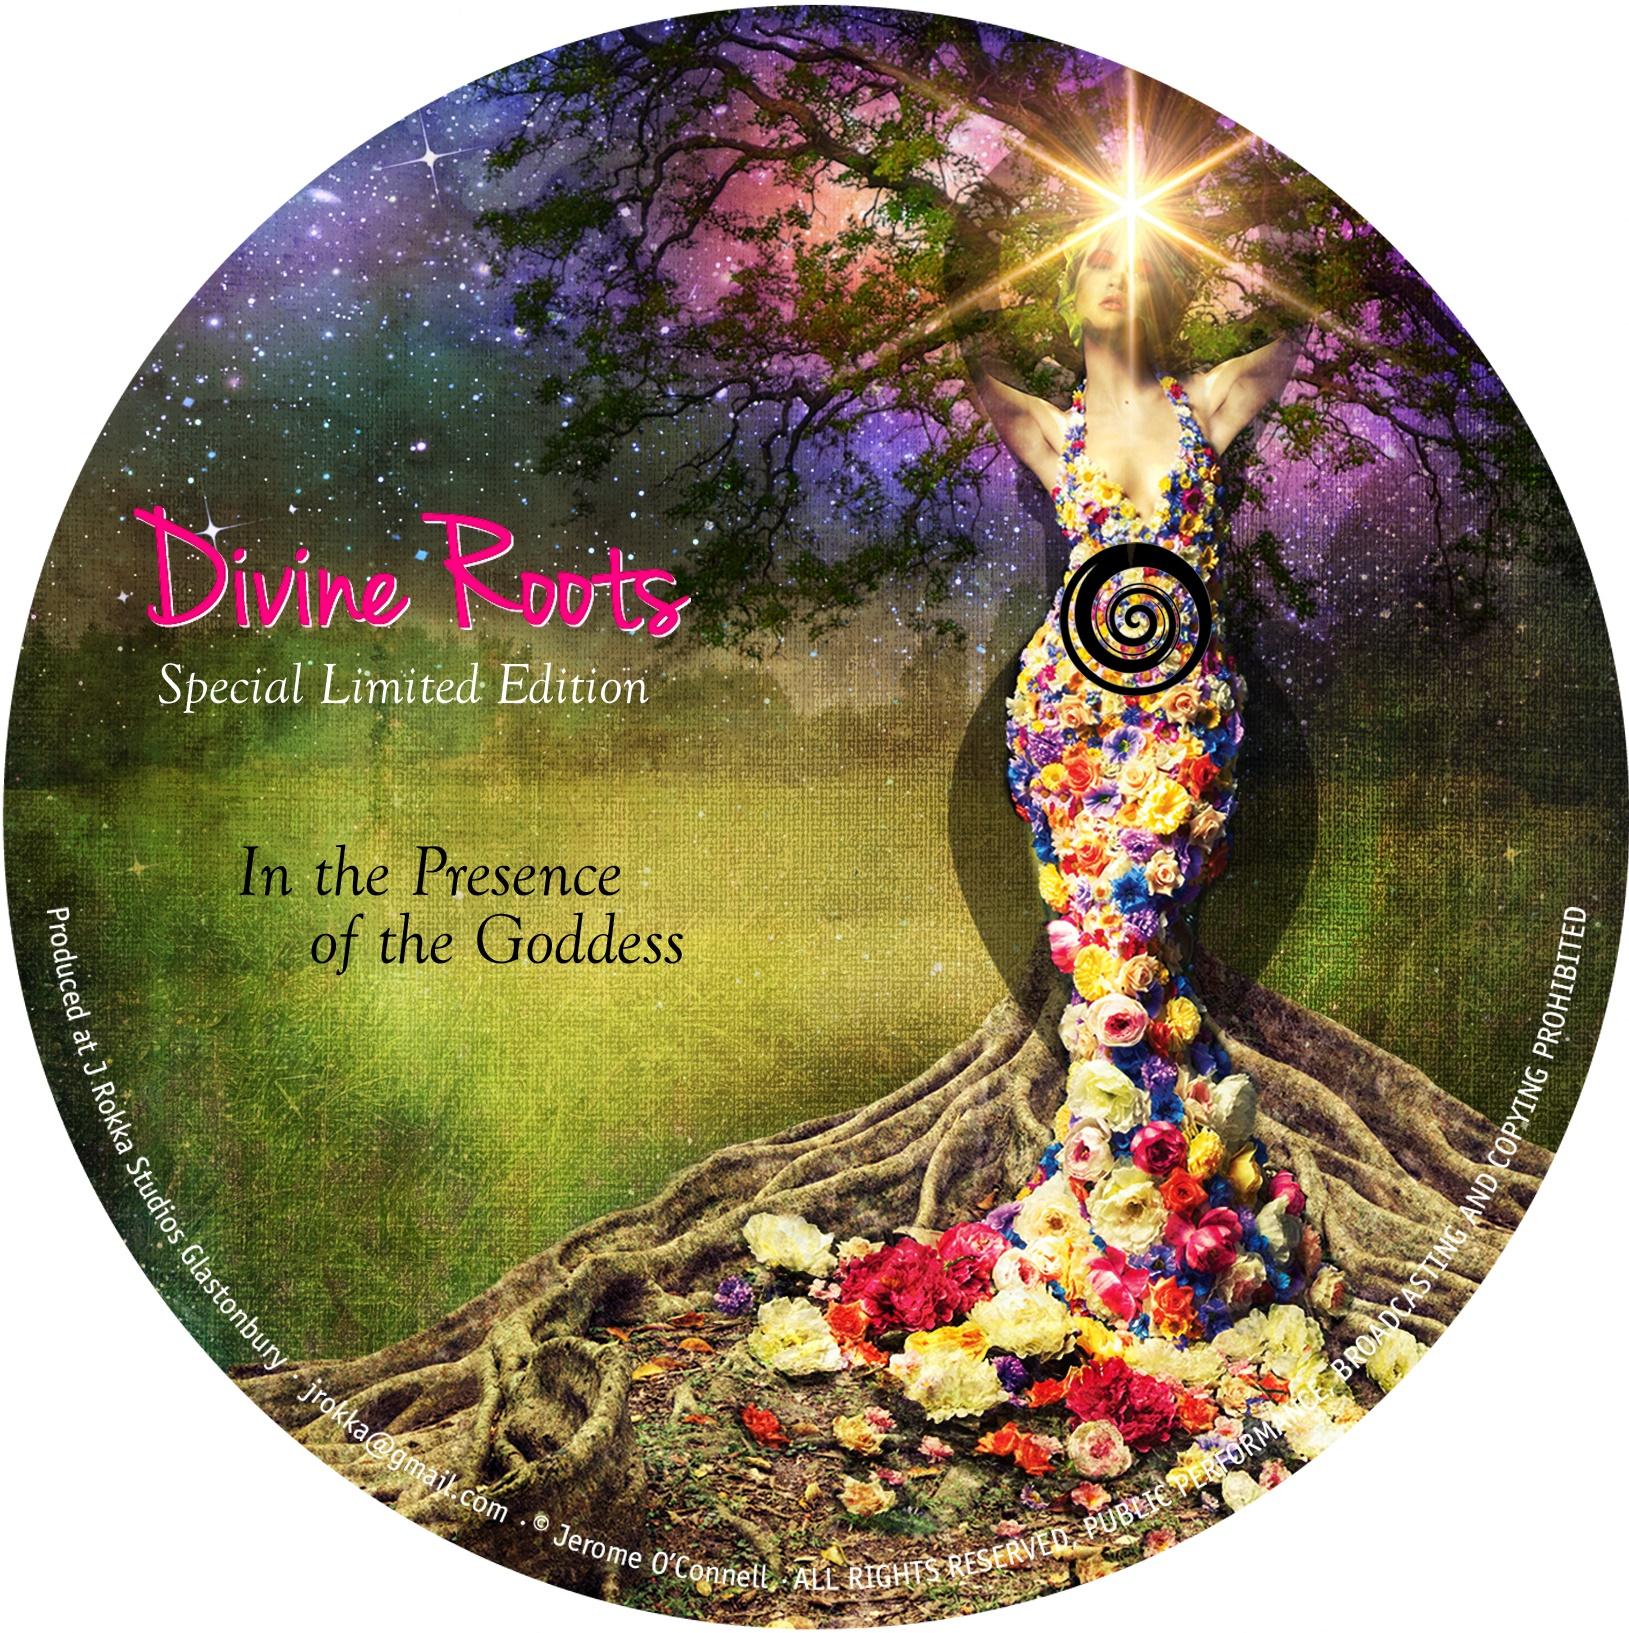 divine roots